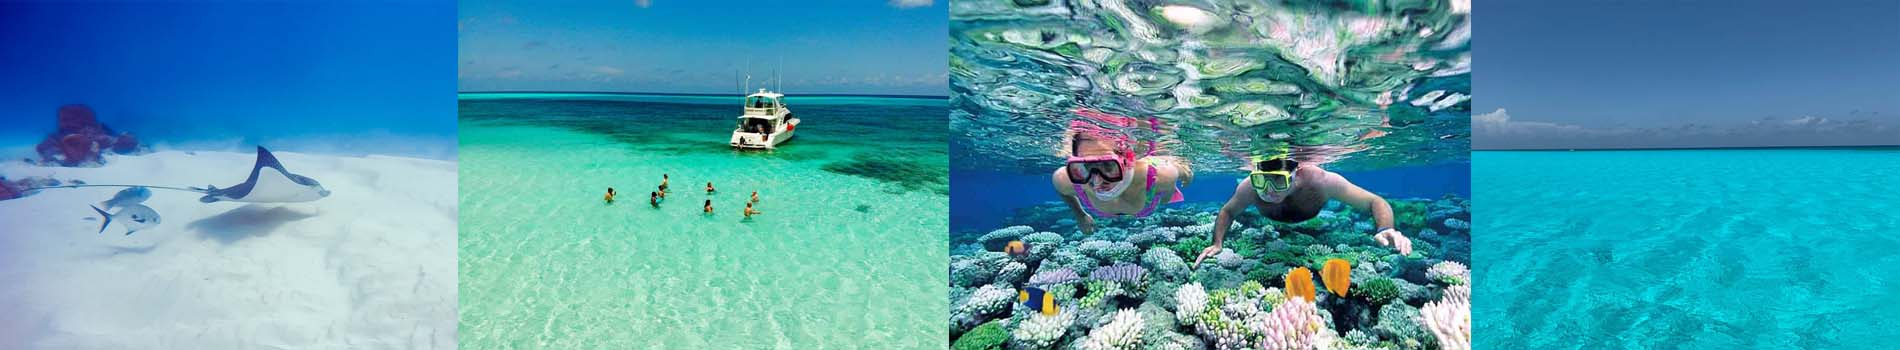 tour a cozumel desde cancun